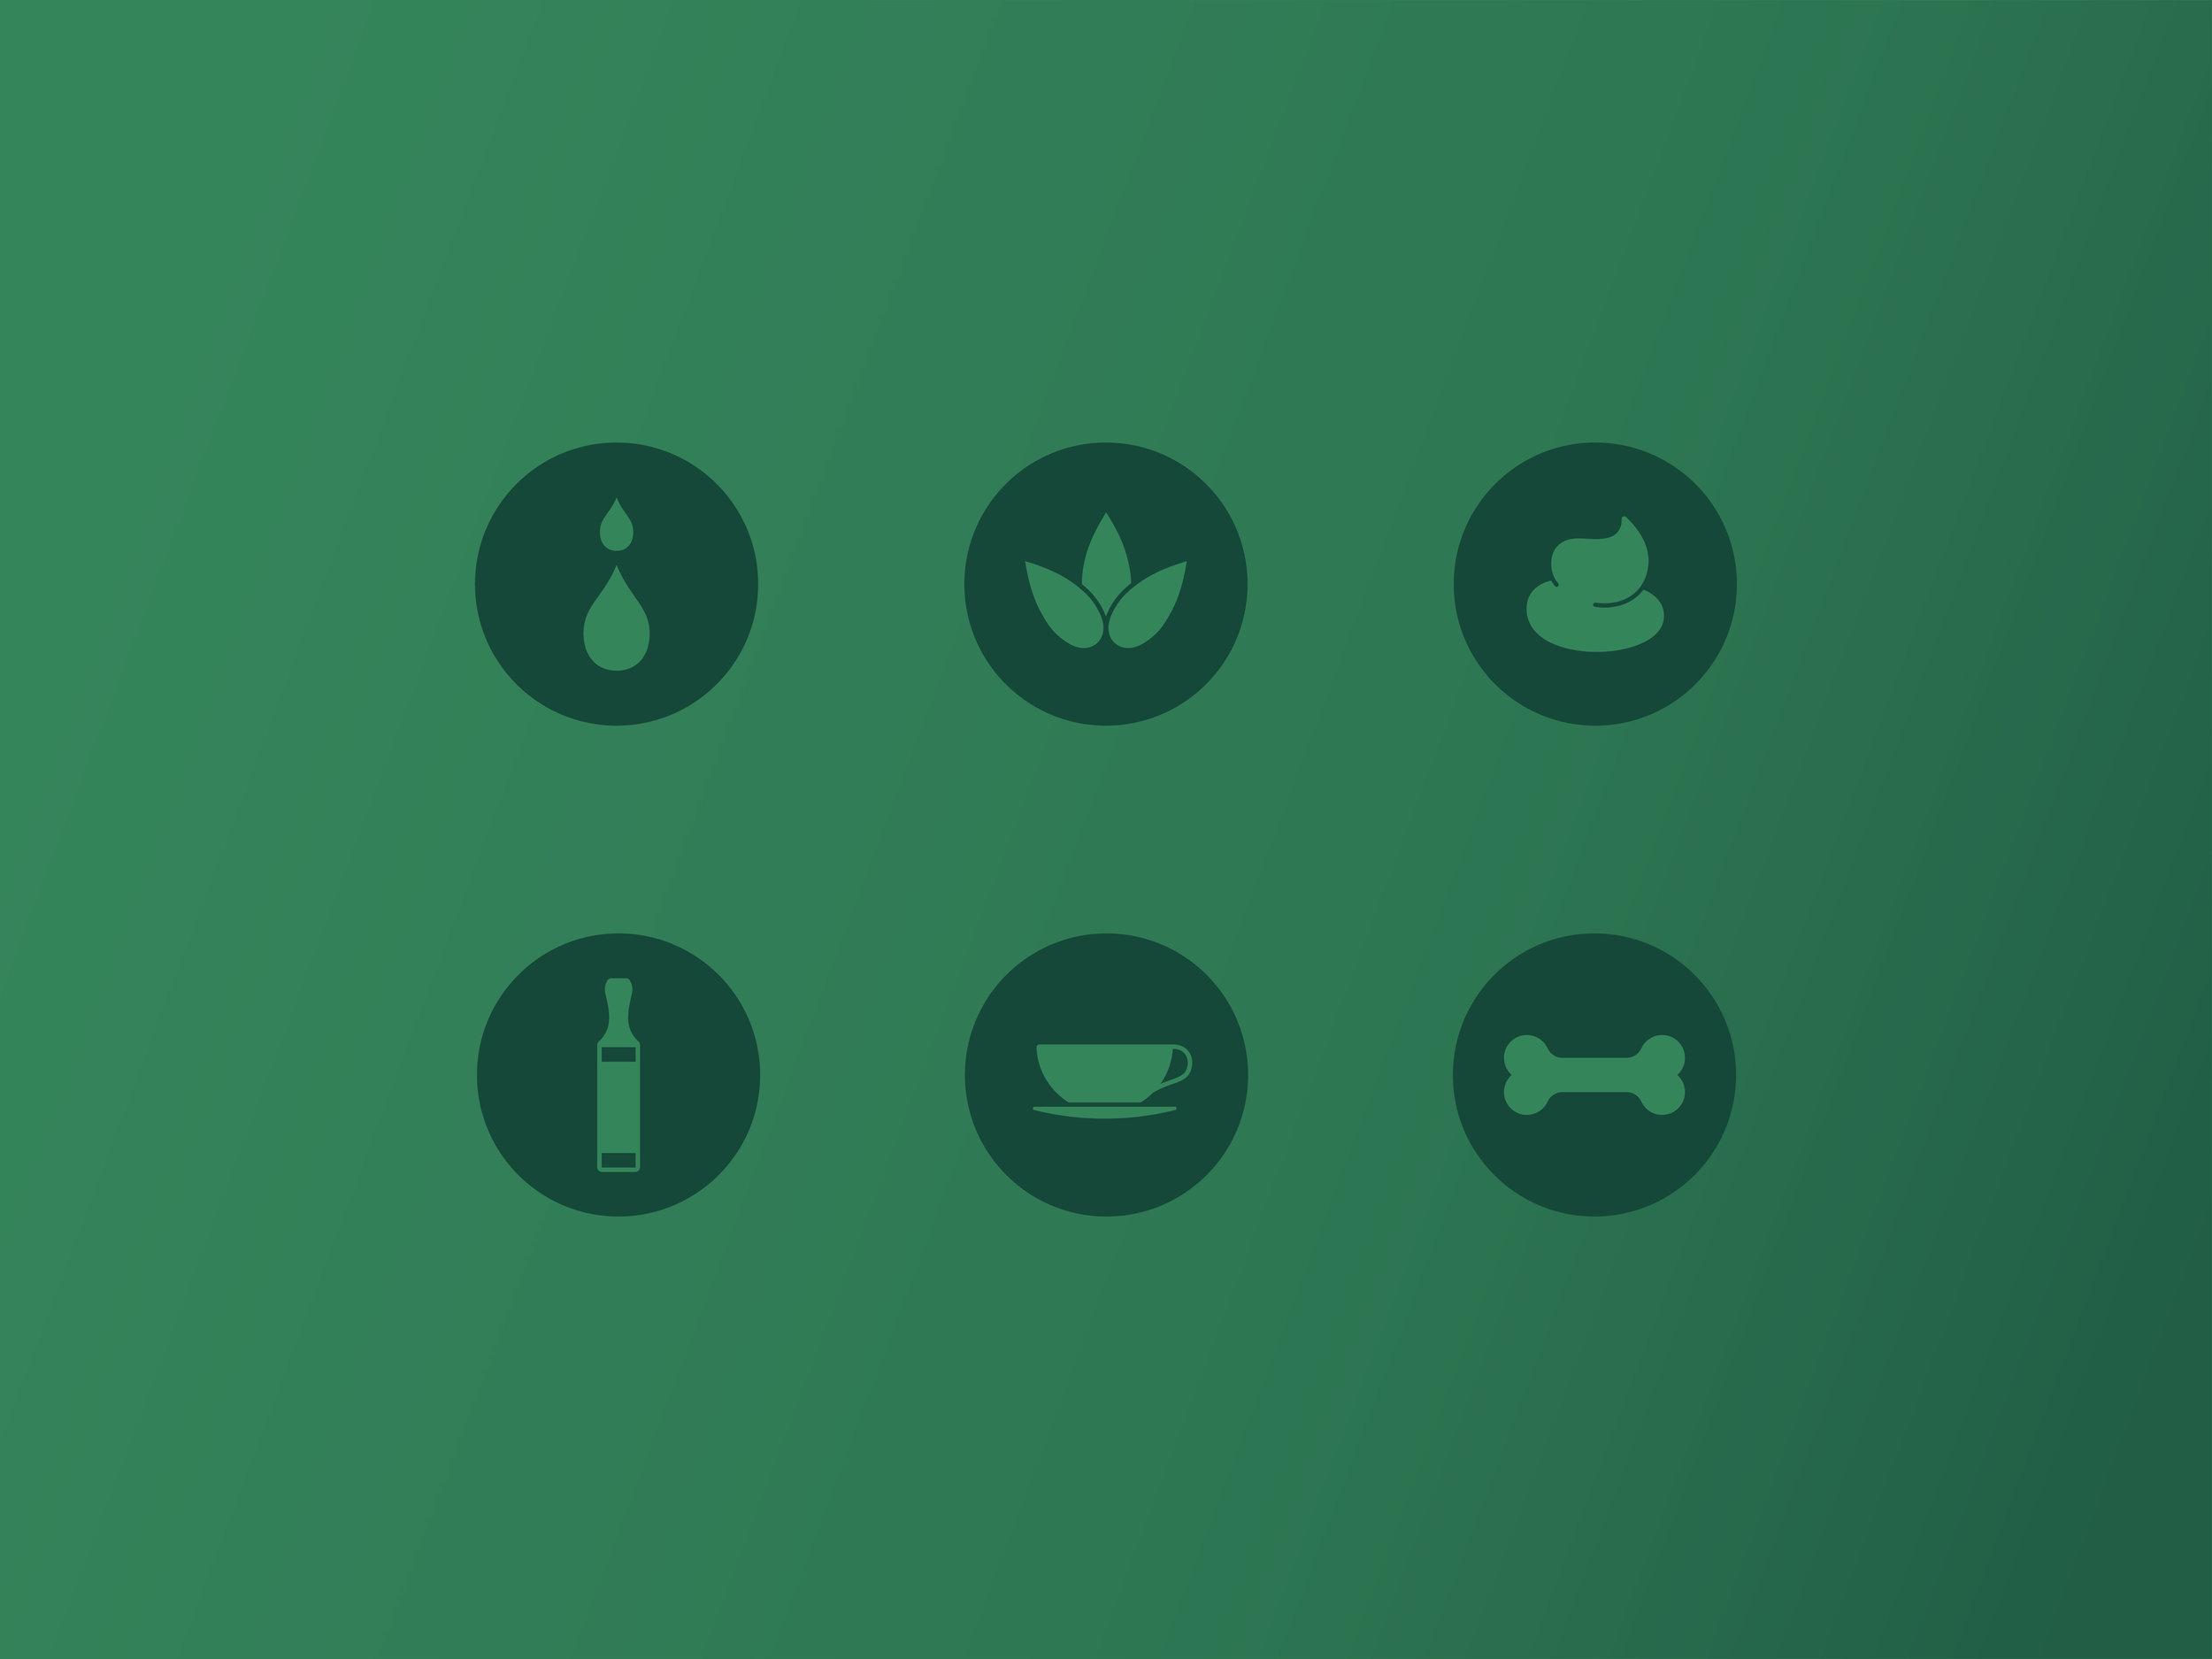 city-trees-icons-01-01.jpg